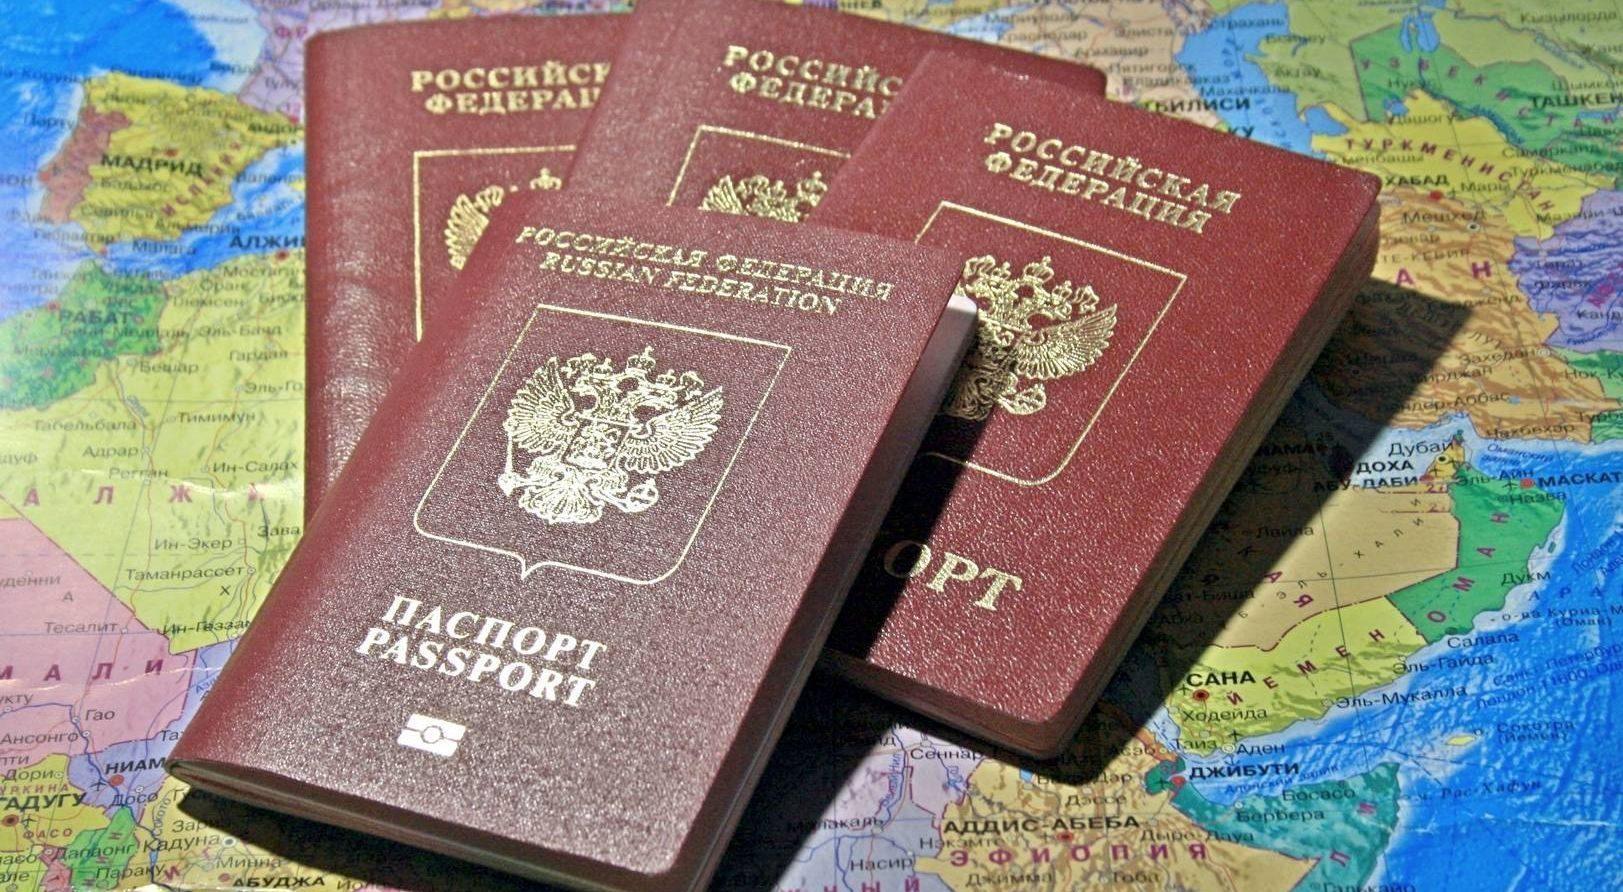 Как выглядит загранпаспорт для граждан РФ